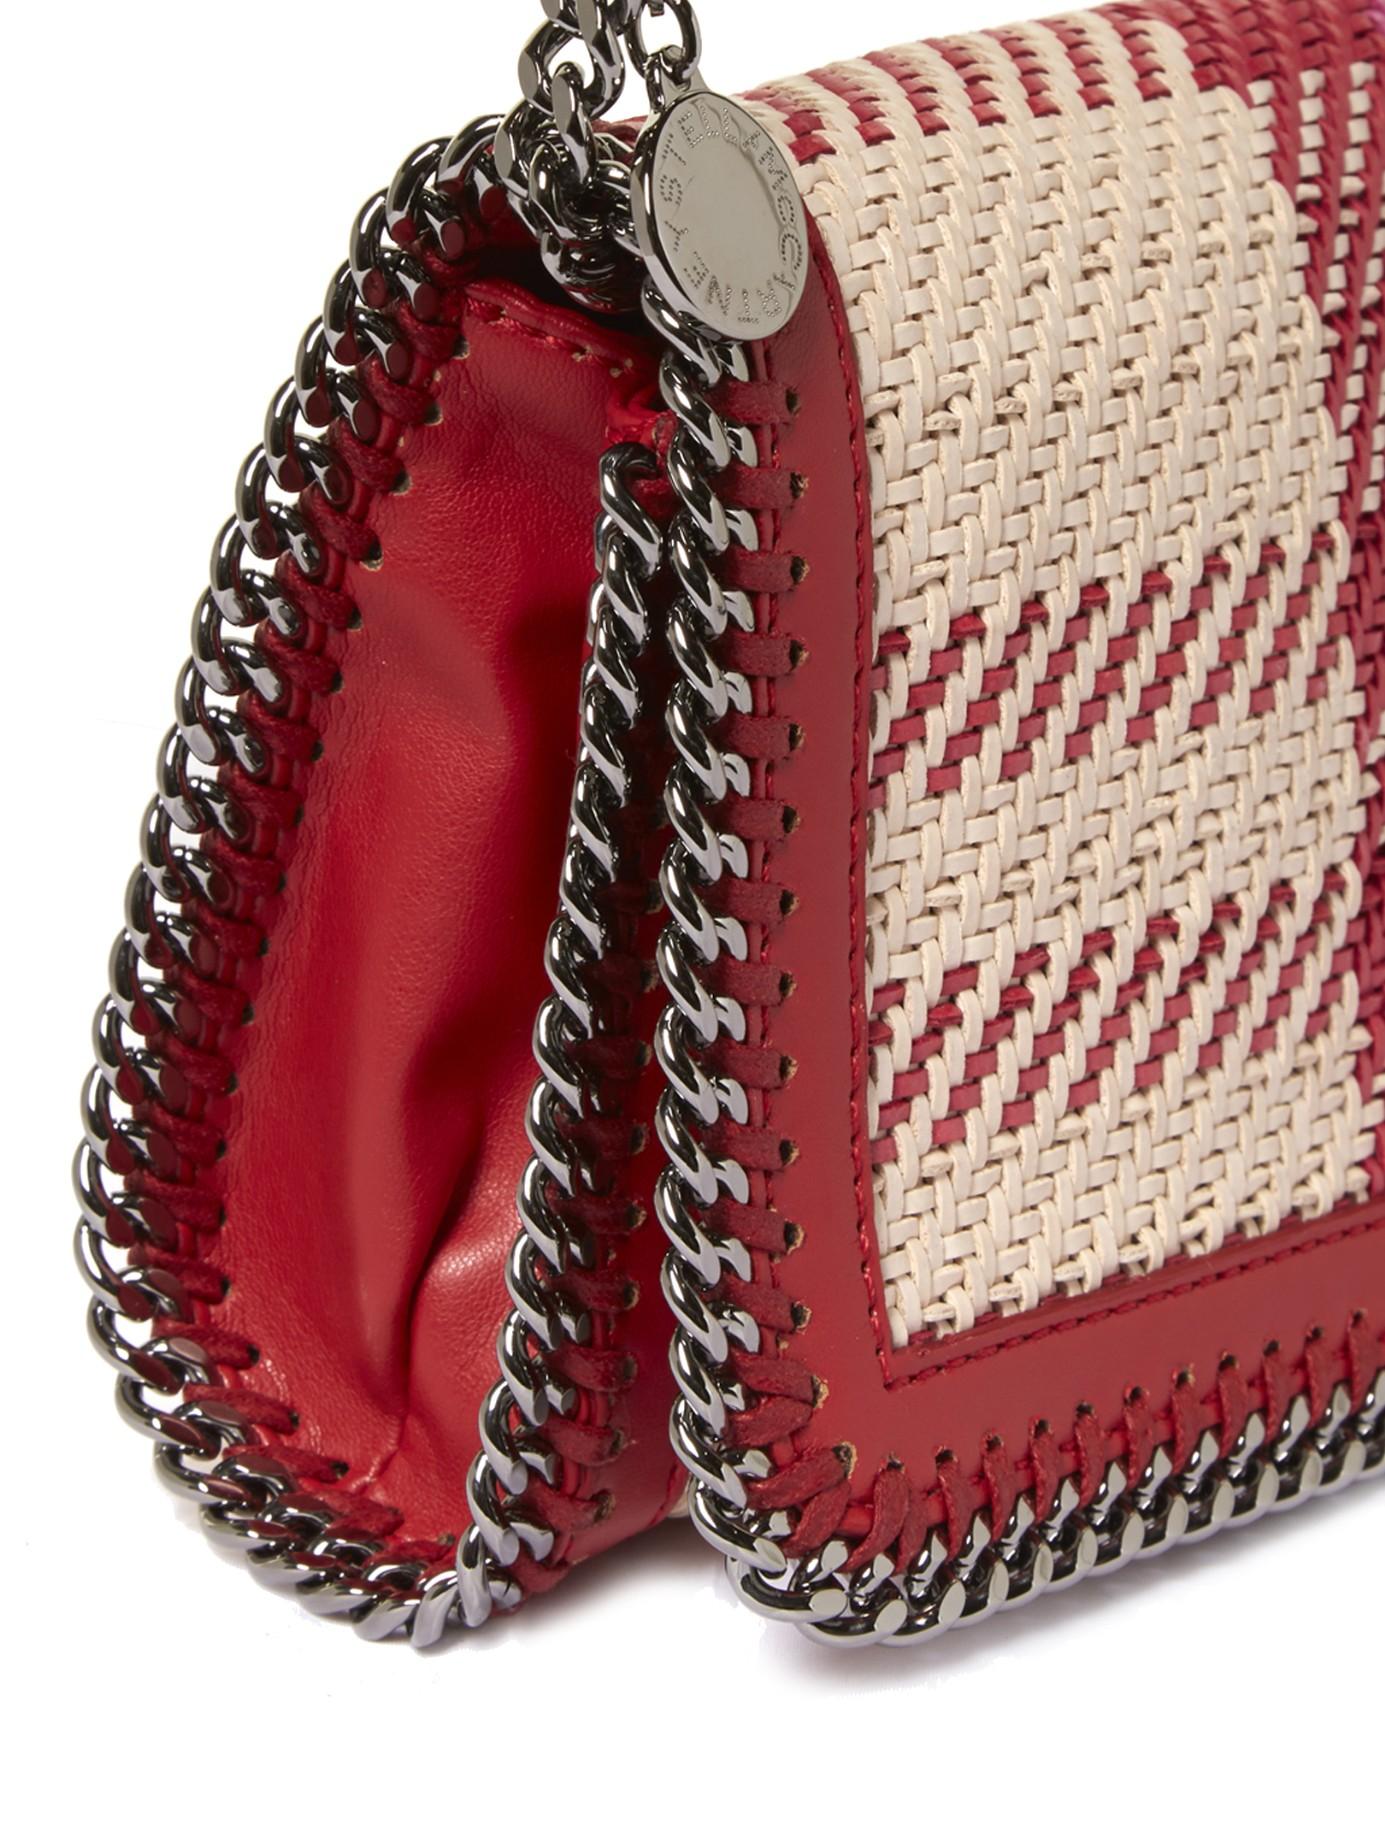 aa7d2f906f Lyst - Stella McCartney Falabella Checked Faux-leather Cross-body ...